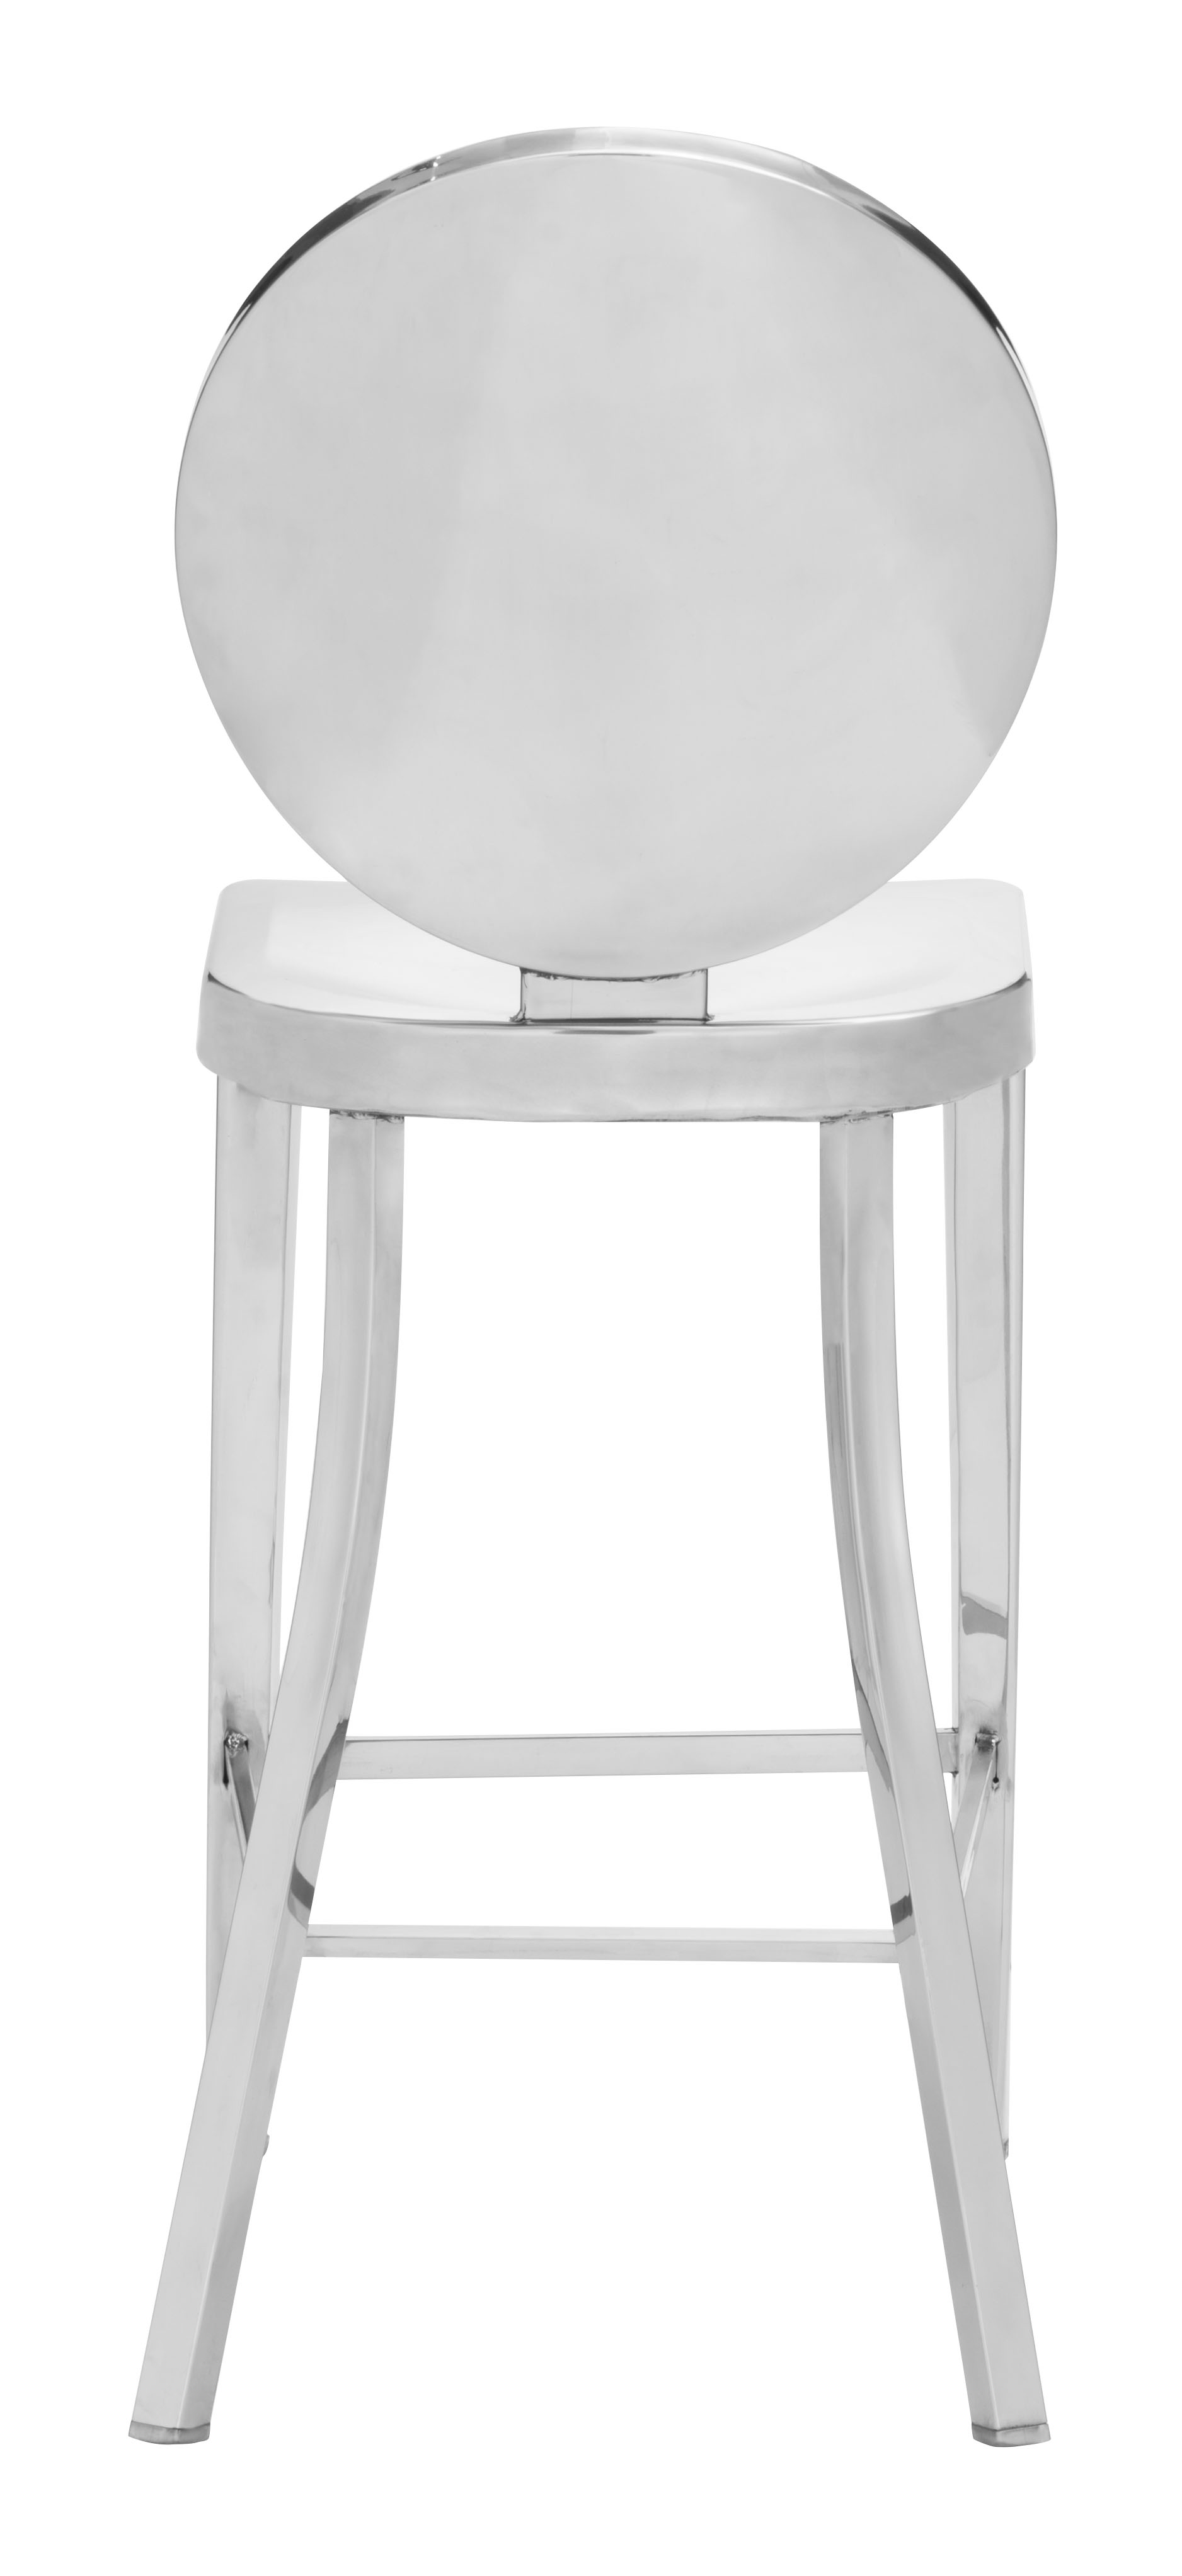 autumn-counter-stool-zuo.jpg